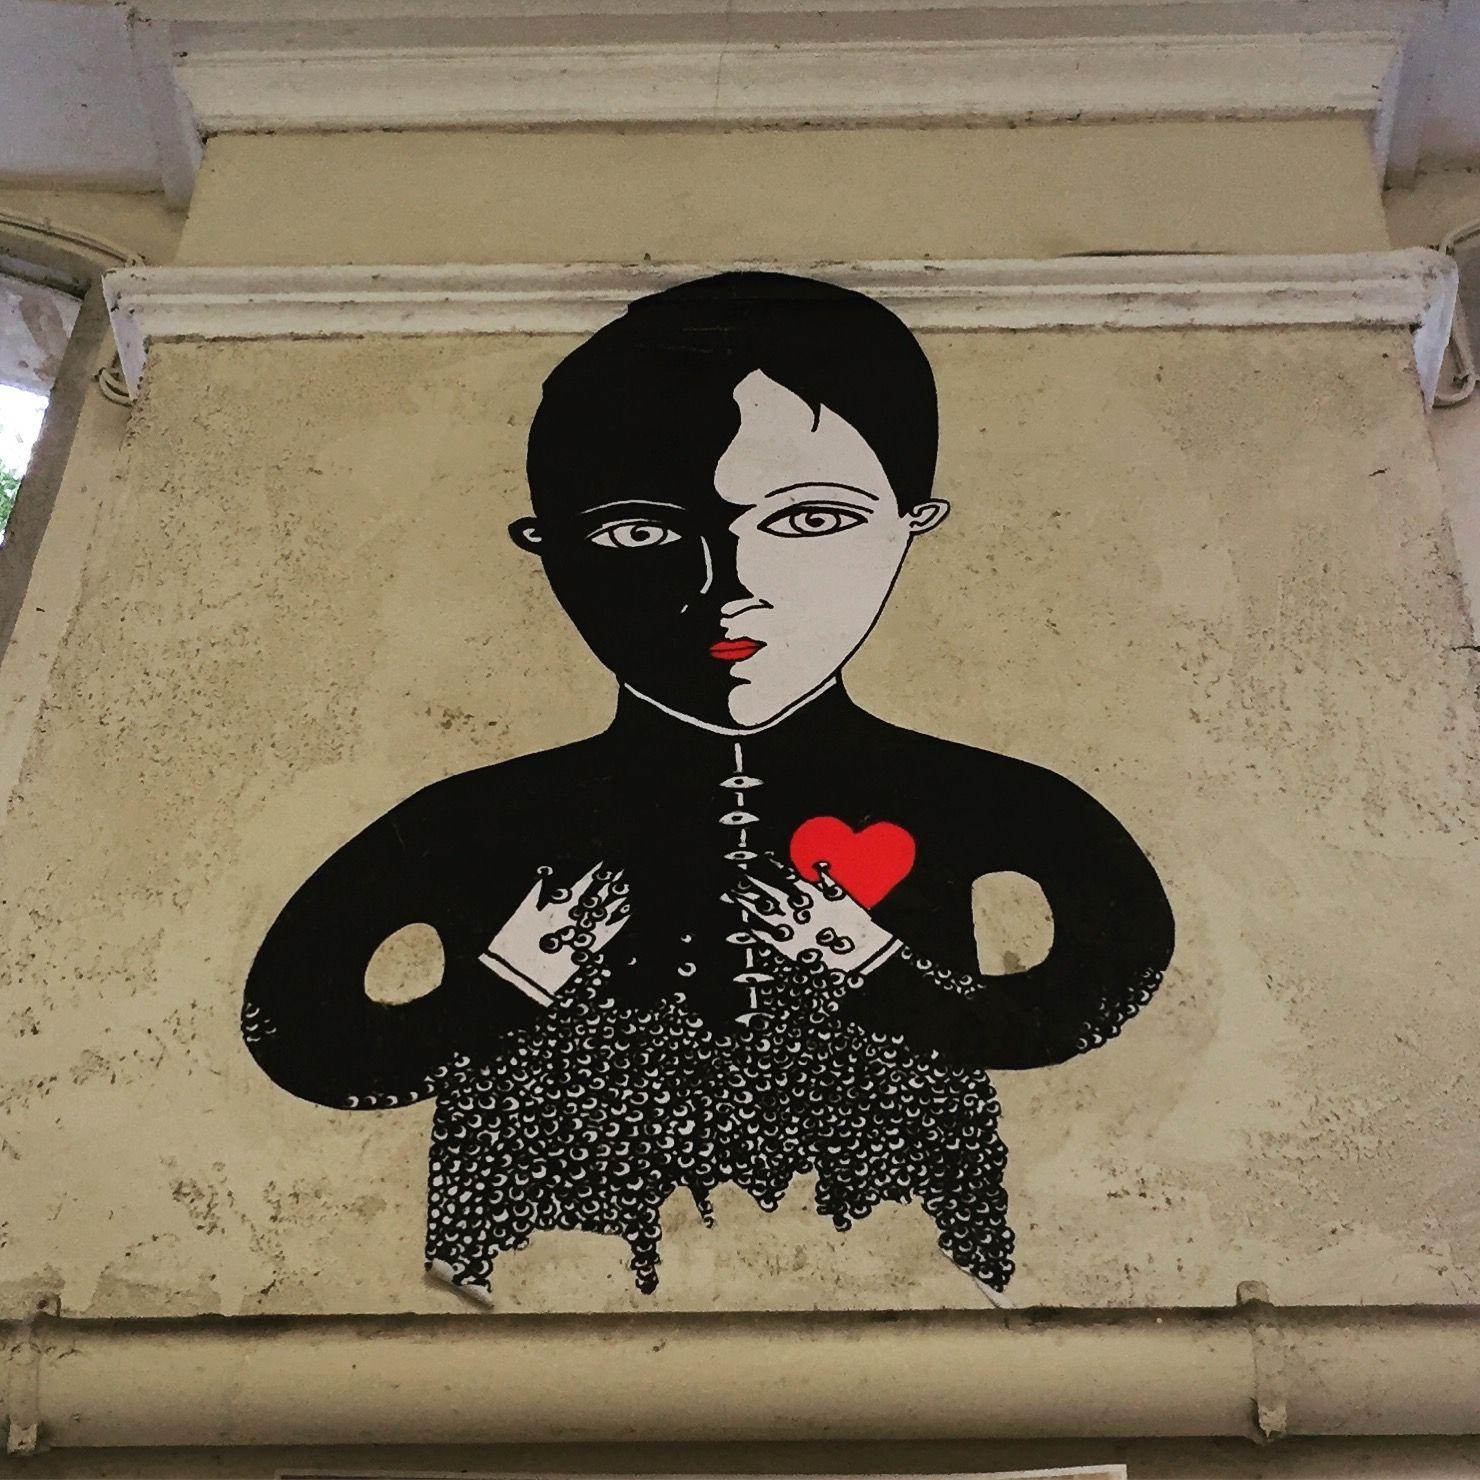 Fred le chevalier street art in paris rue notre dame de nazareth